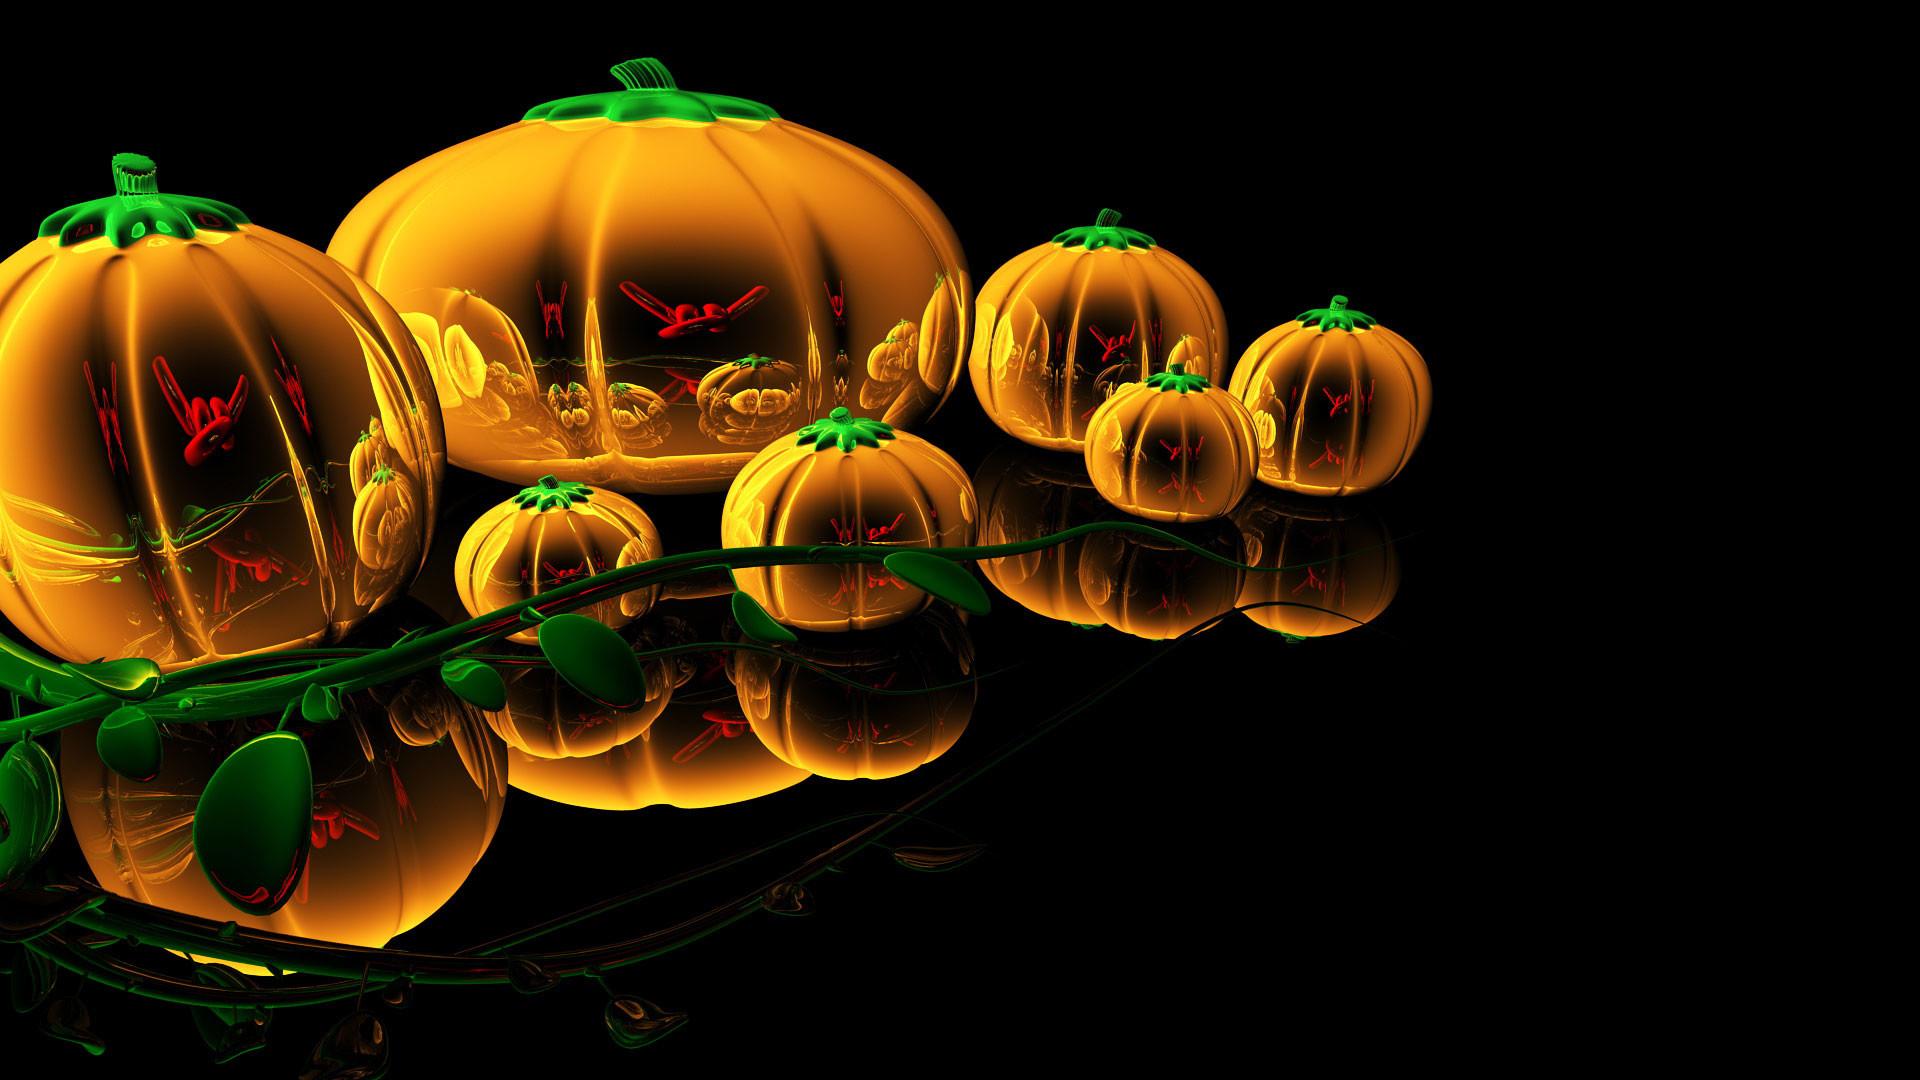 3D Halloween Wallpaper 59 images 1920x1080